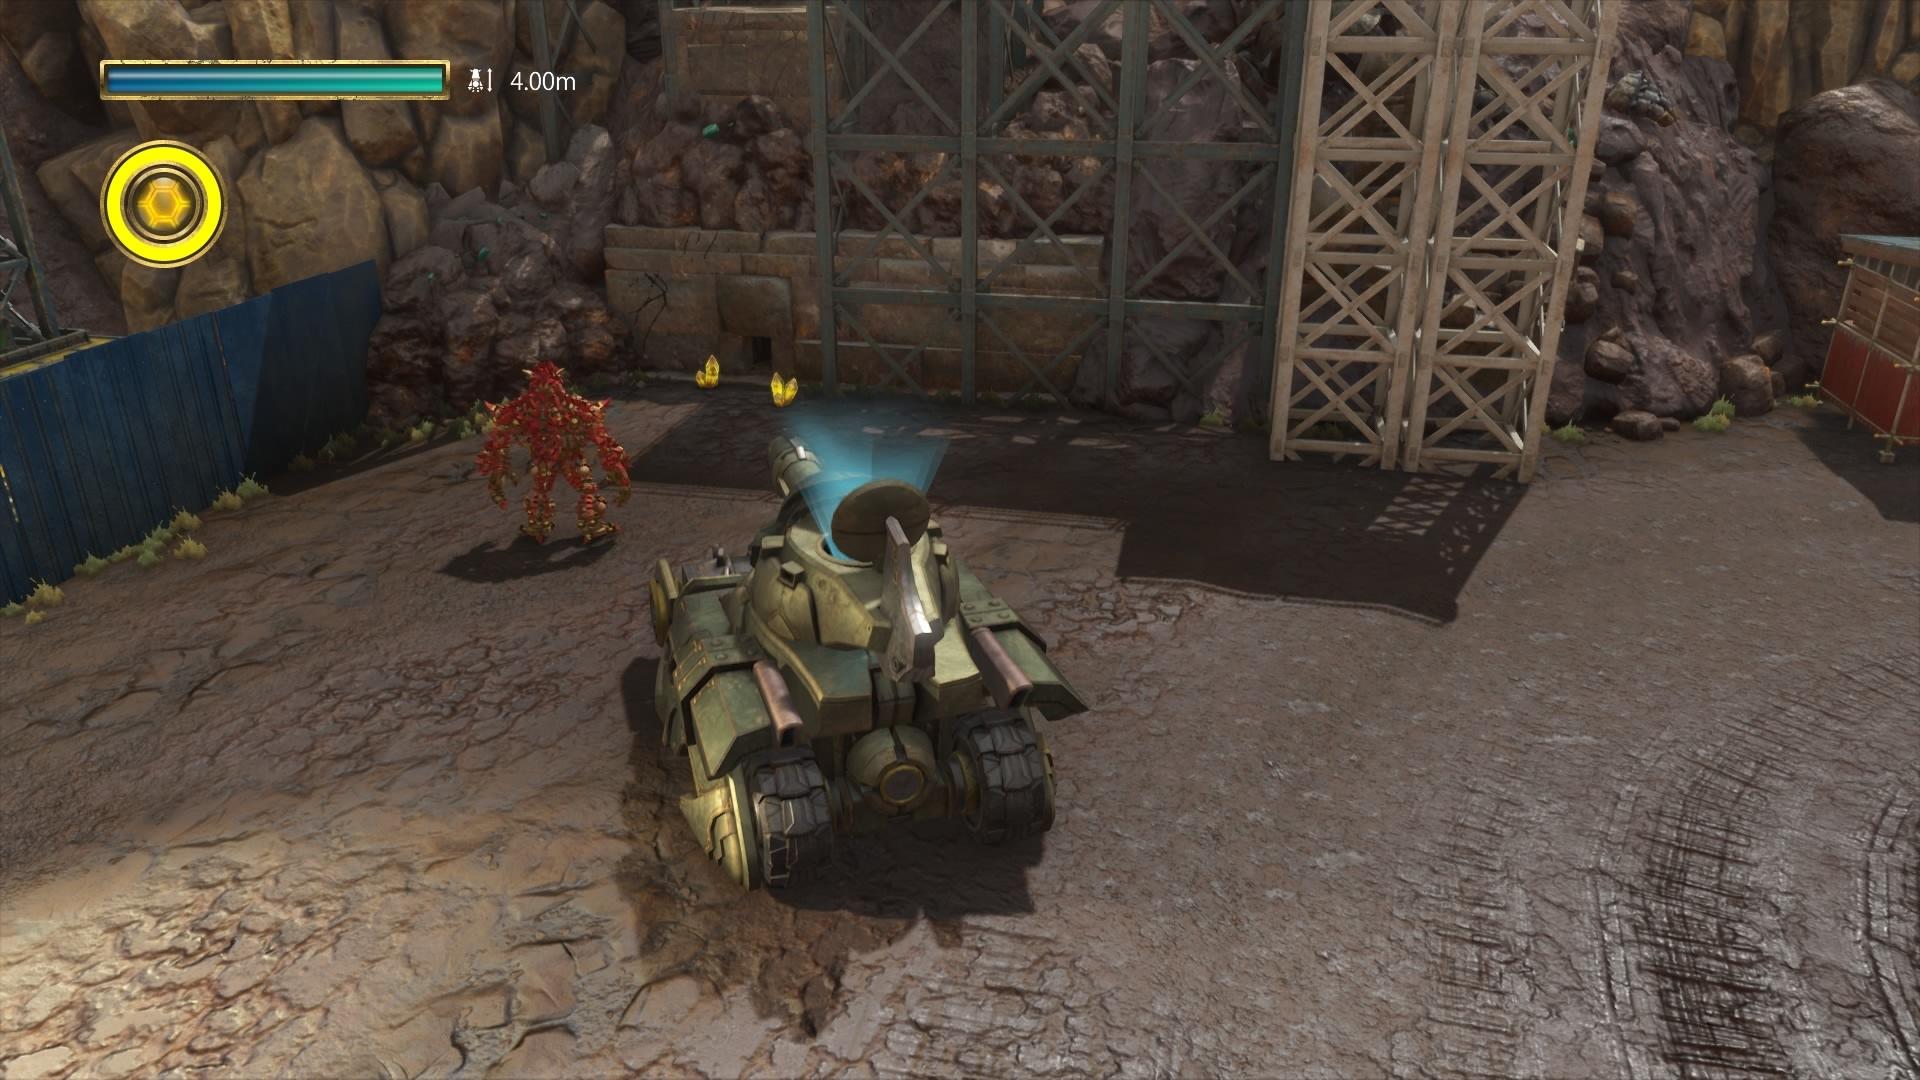 KNACK ふたりの英雄と古代兵団® 7-3 疾走! ナック戦車-1